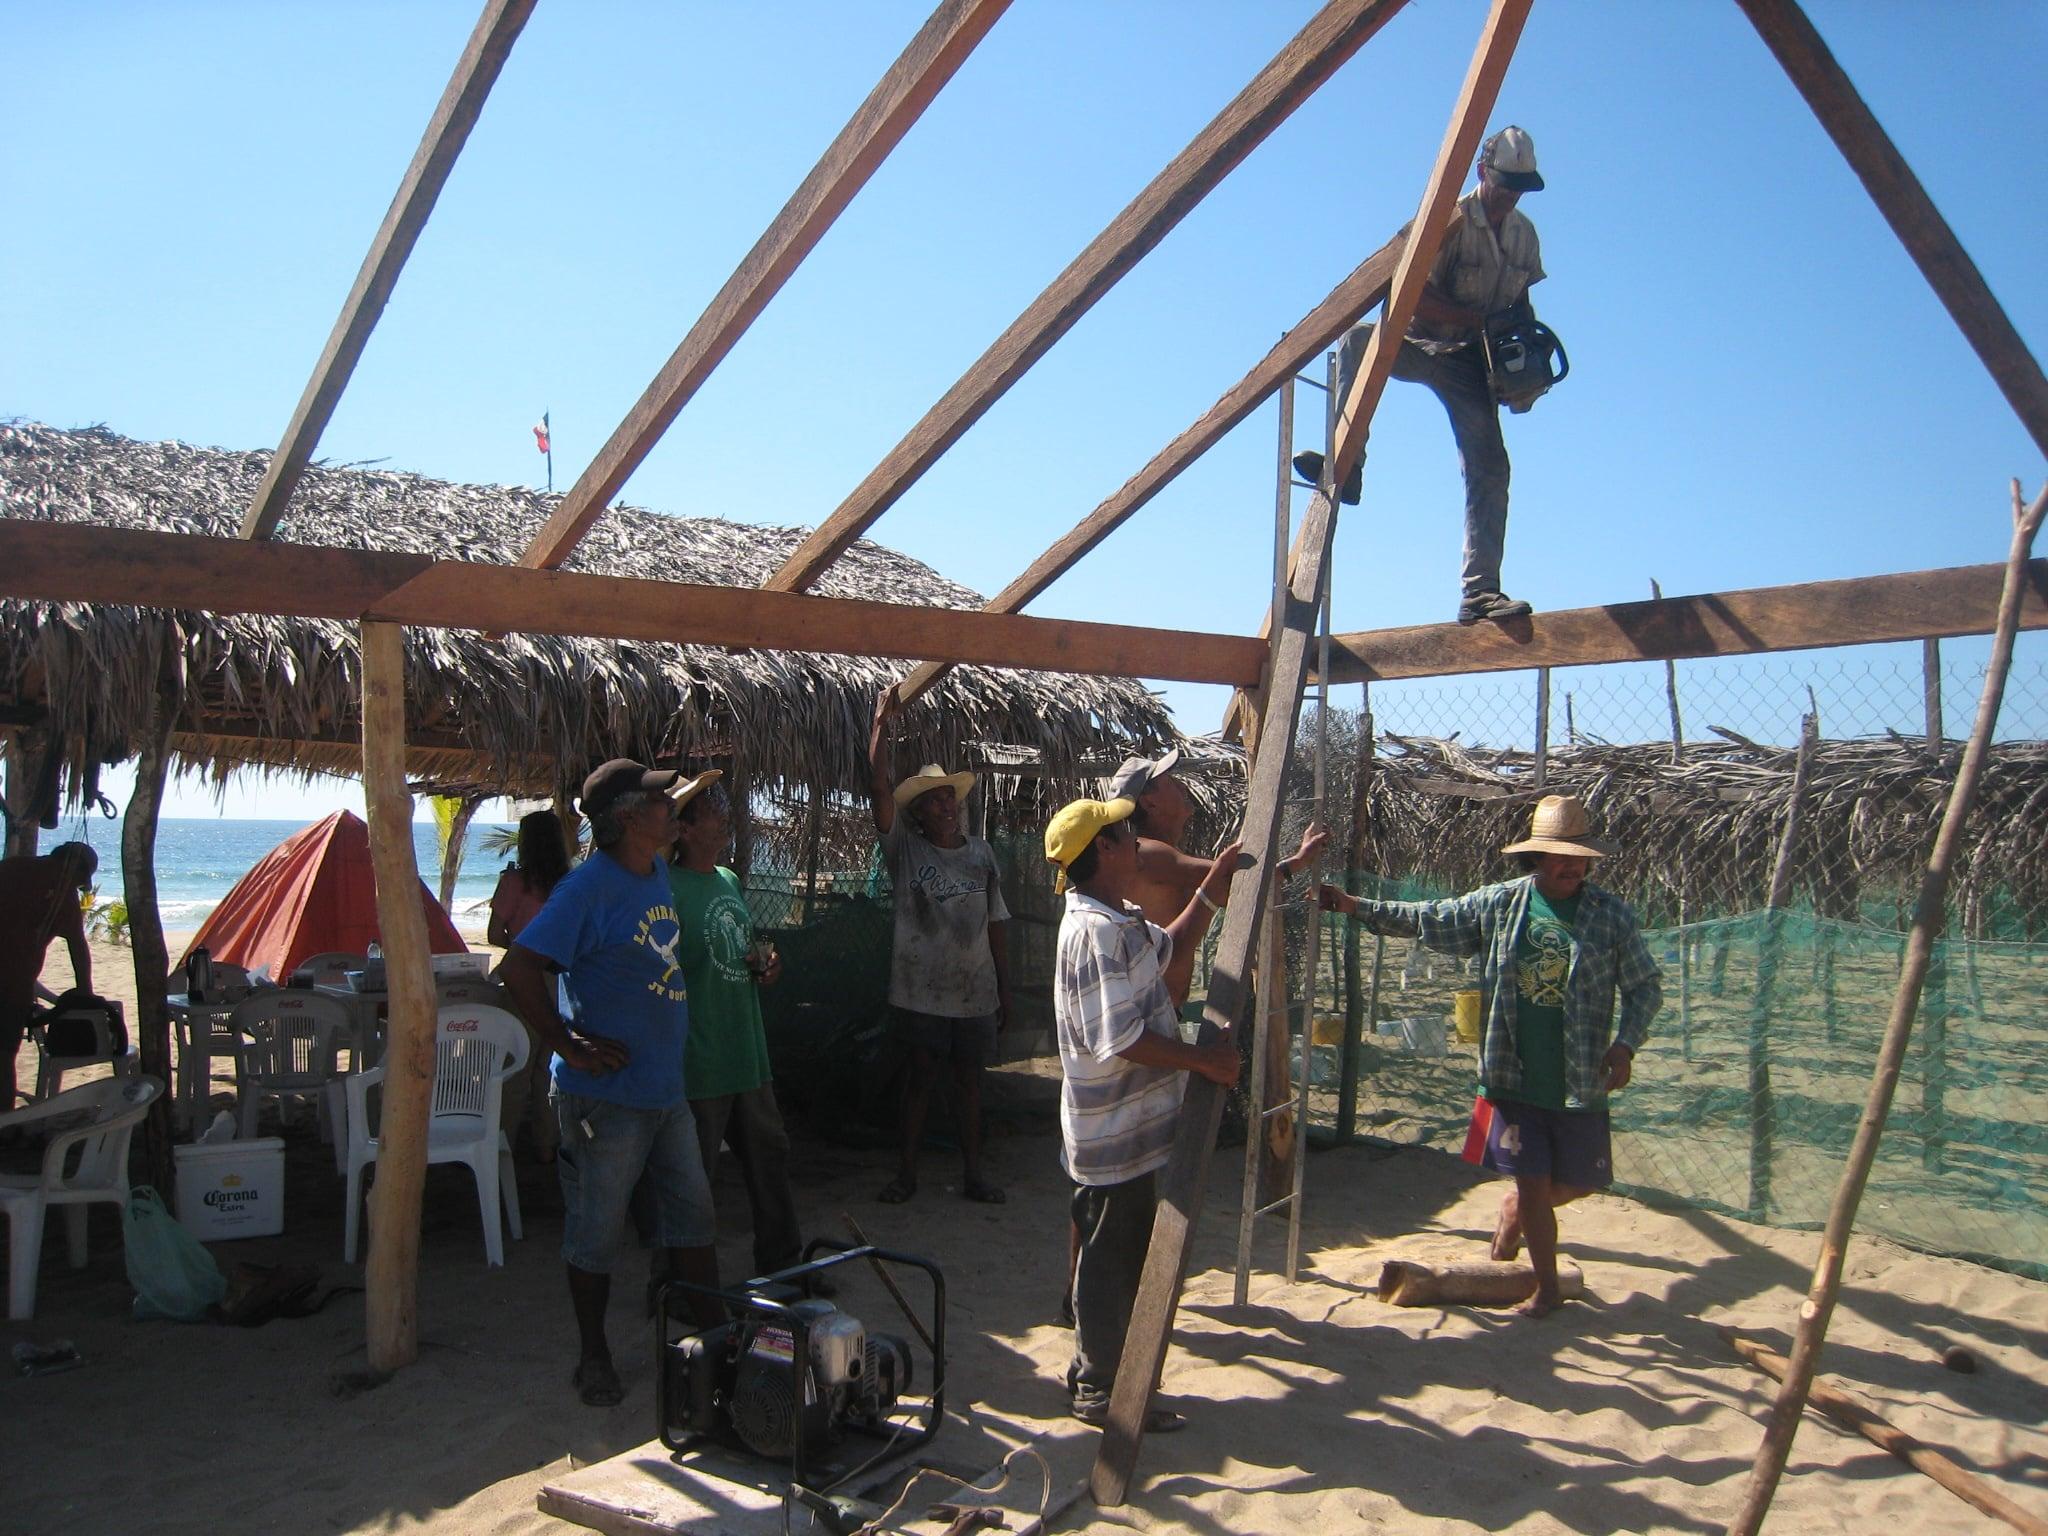 Mexican Version of a Barn Raising